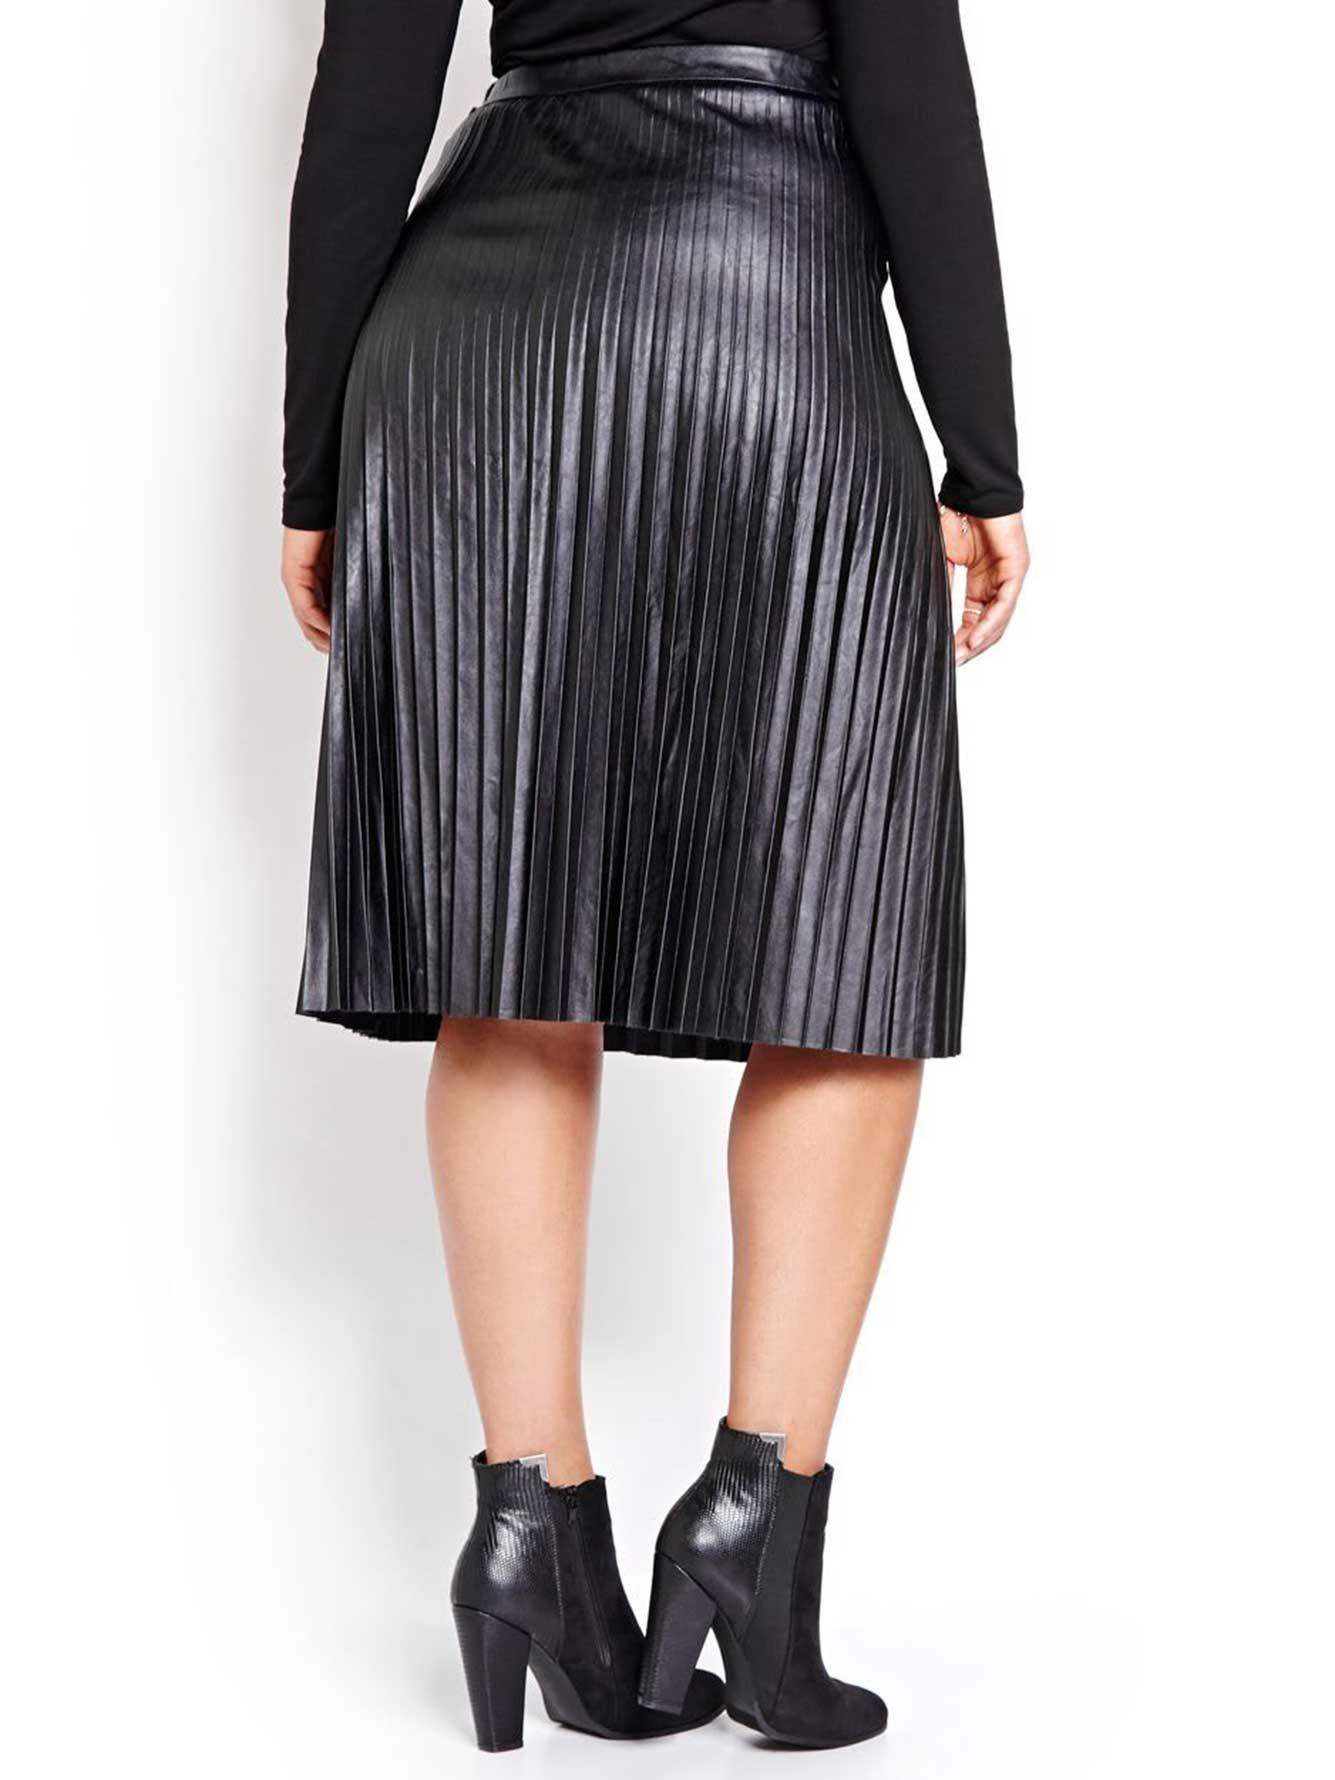 l l pleated midi pleather skirt addition